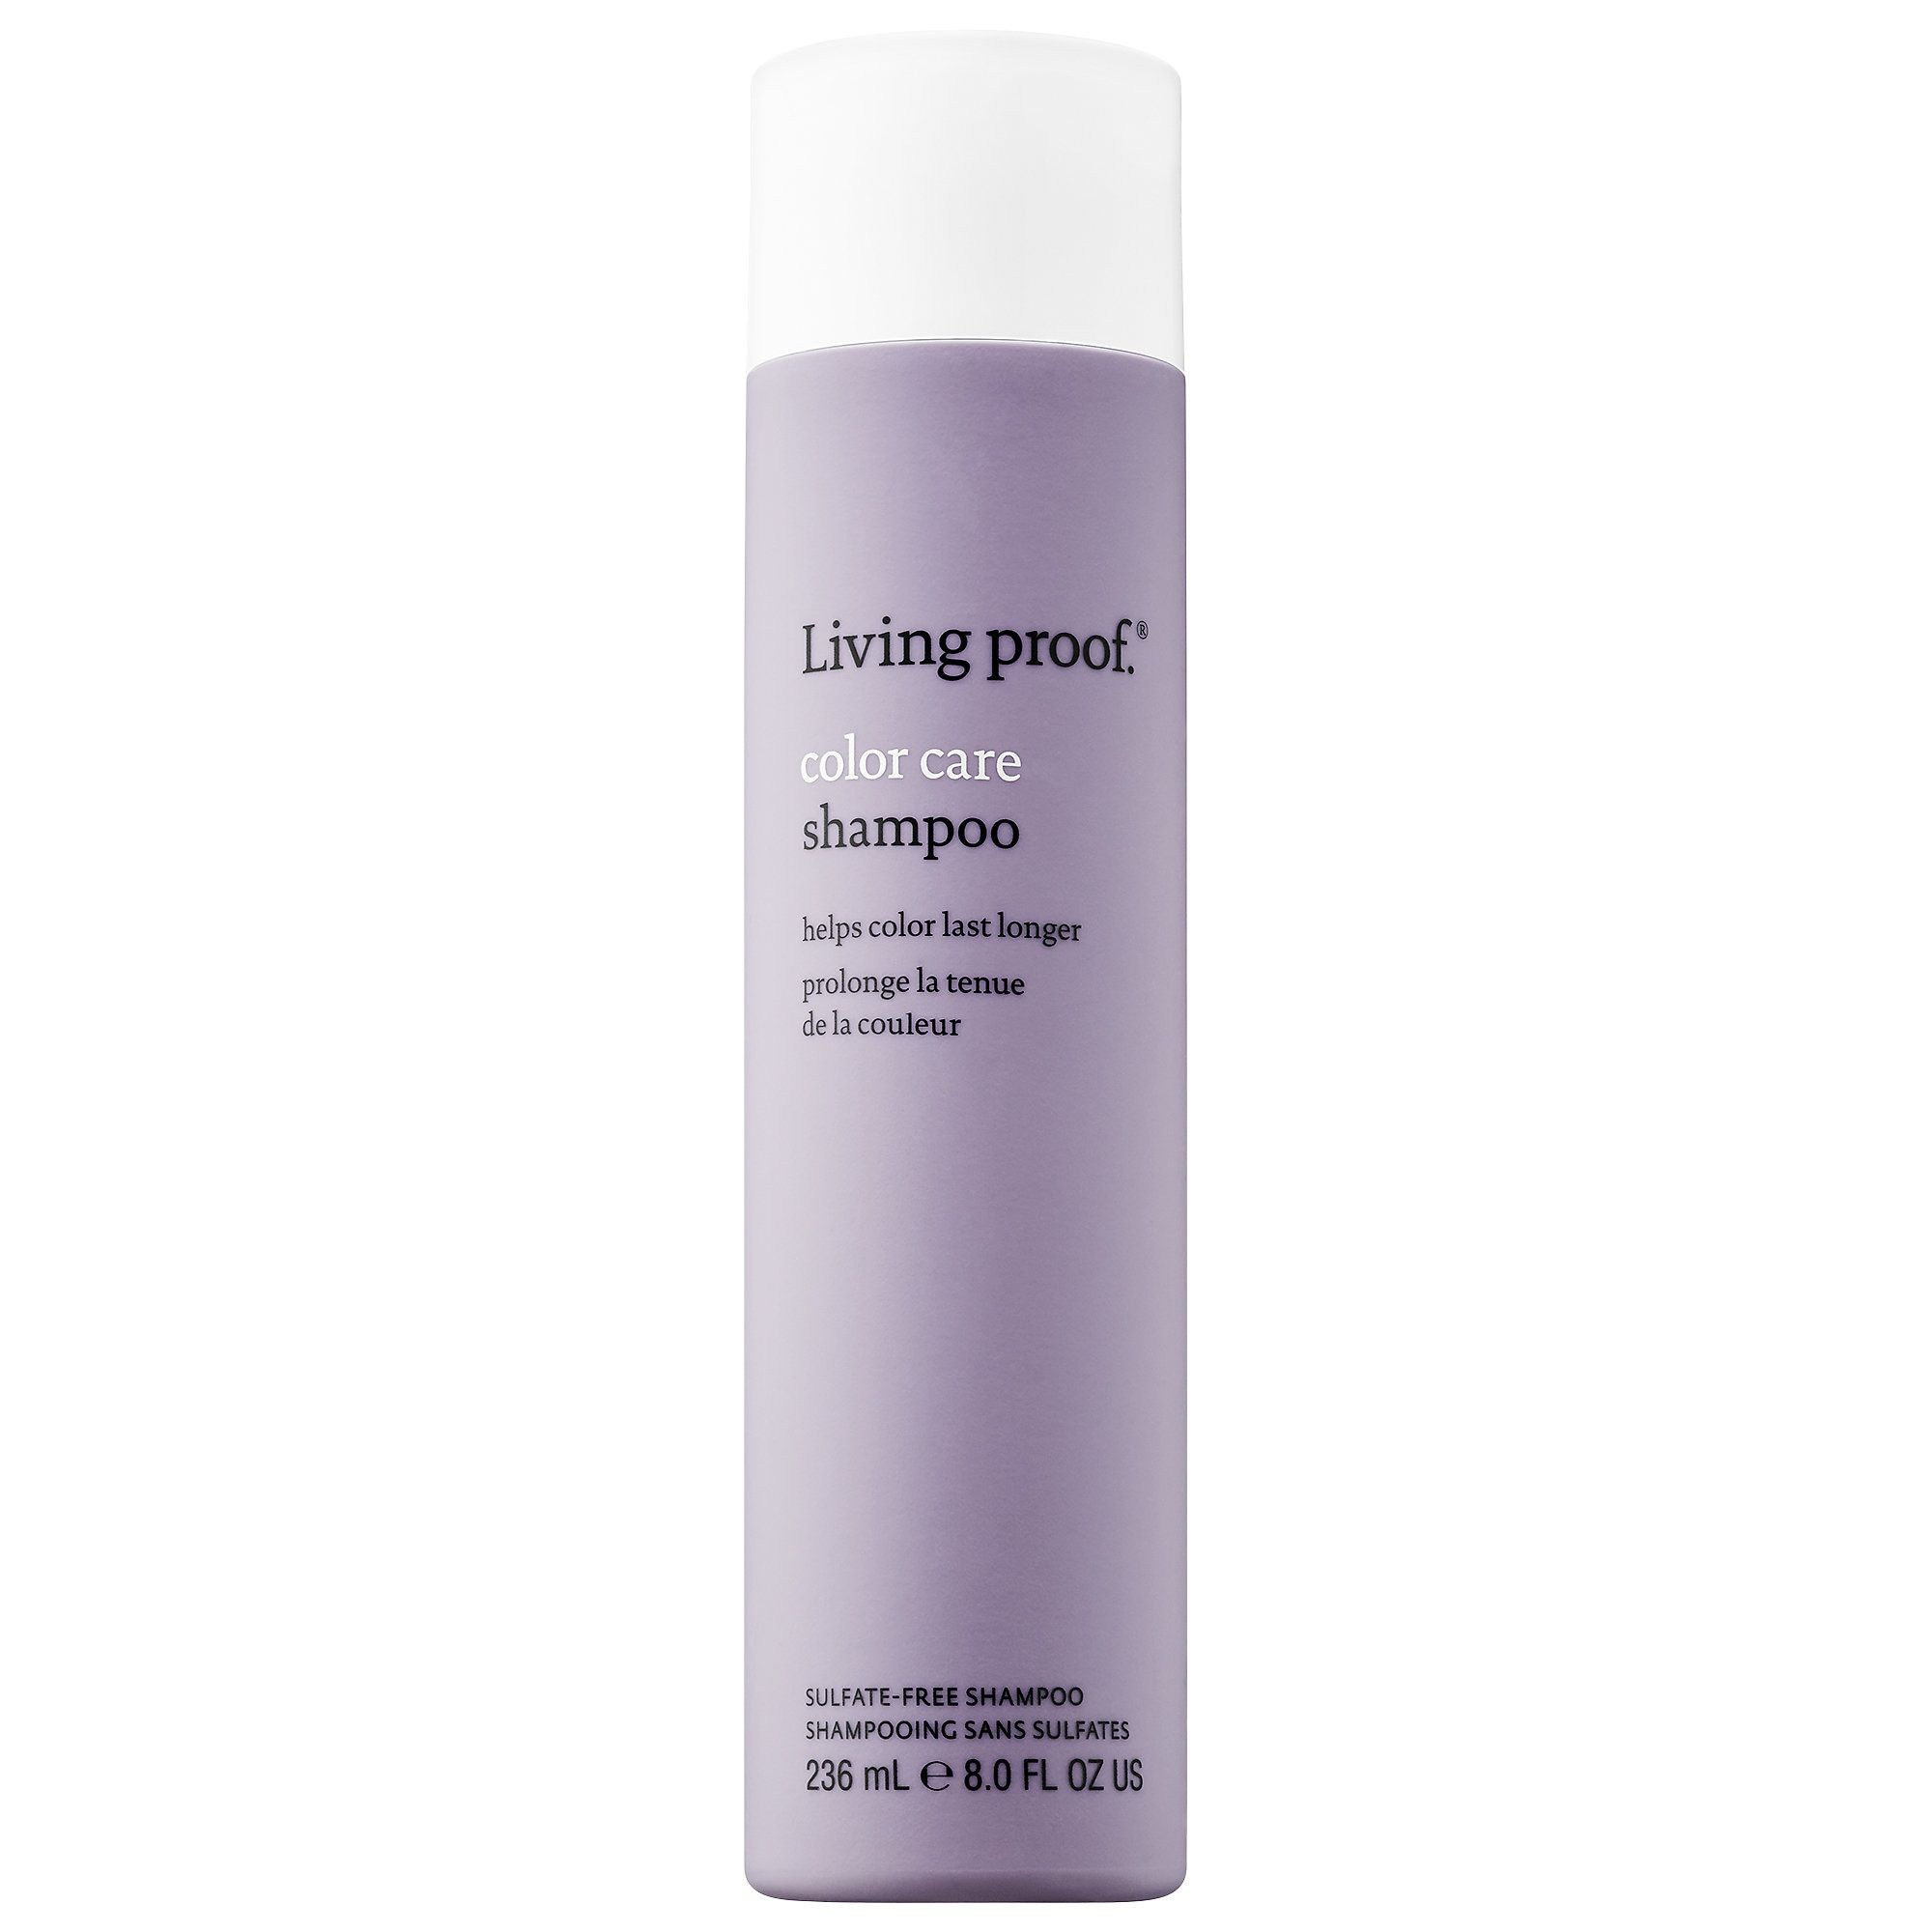 Best Shampoos For Color Treated Hair 2021